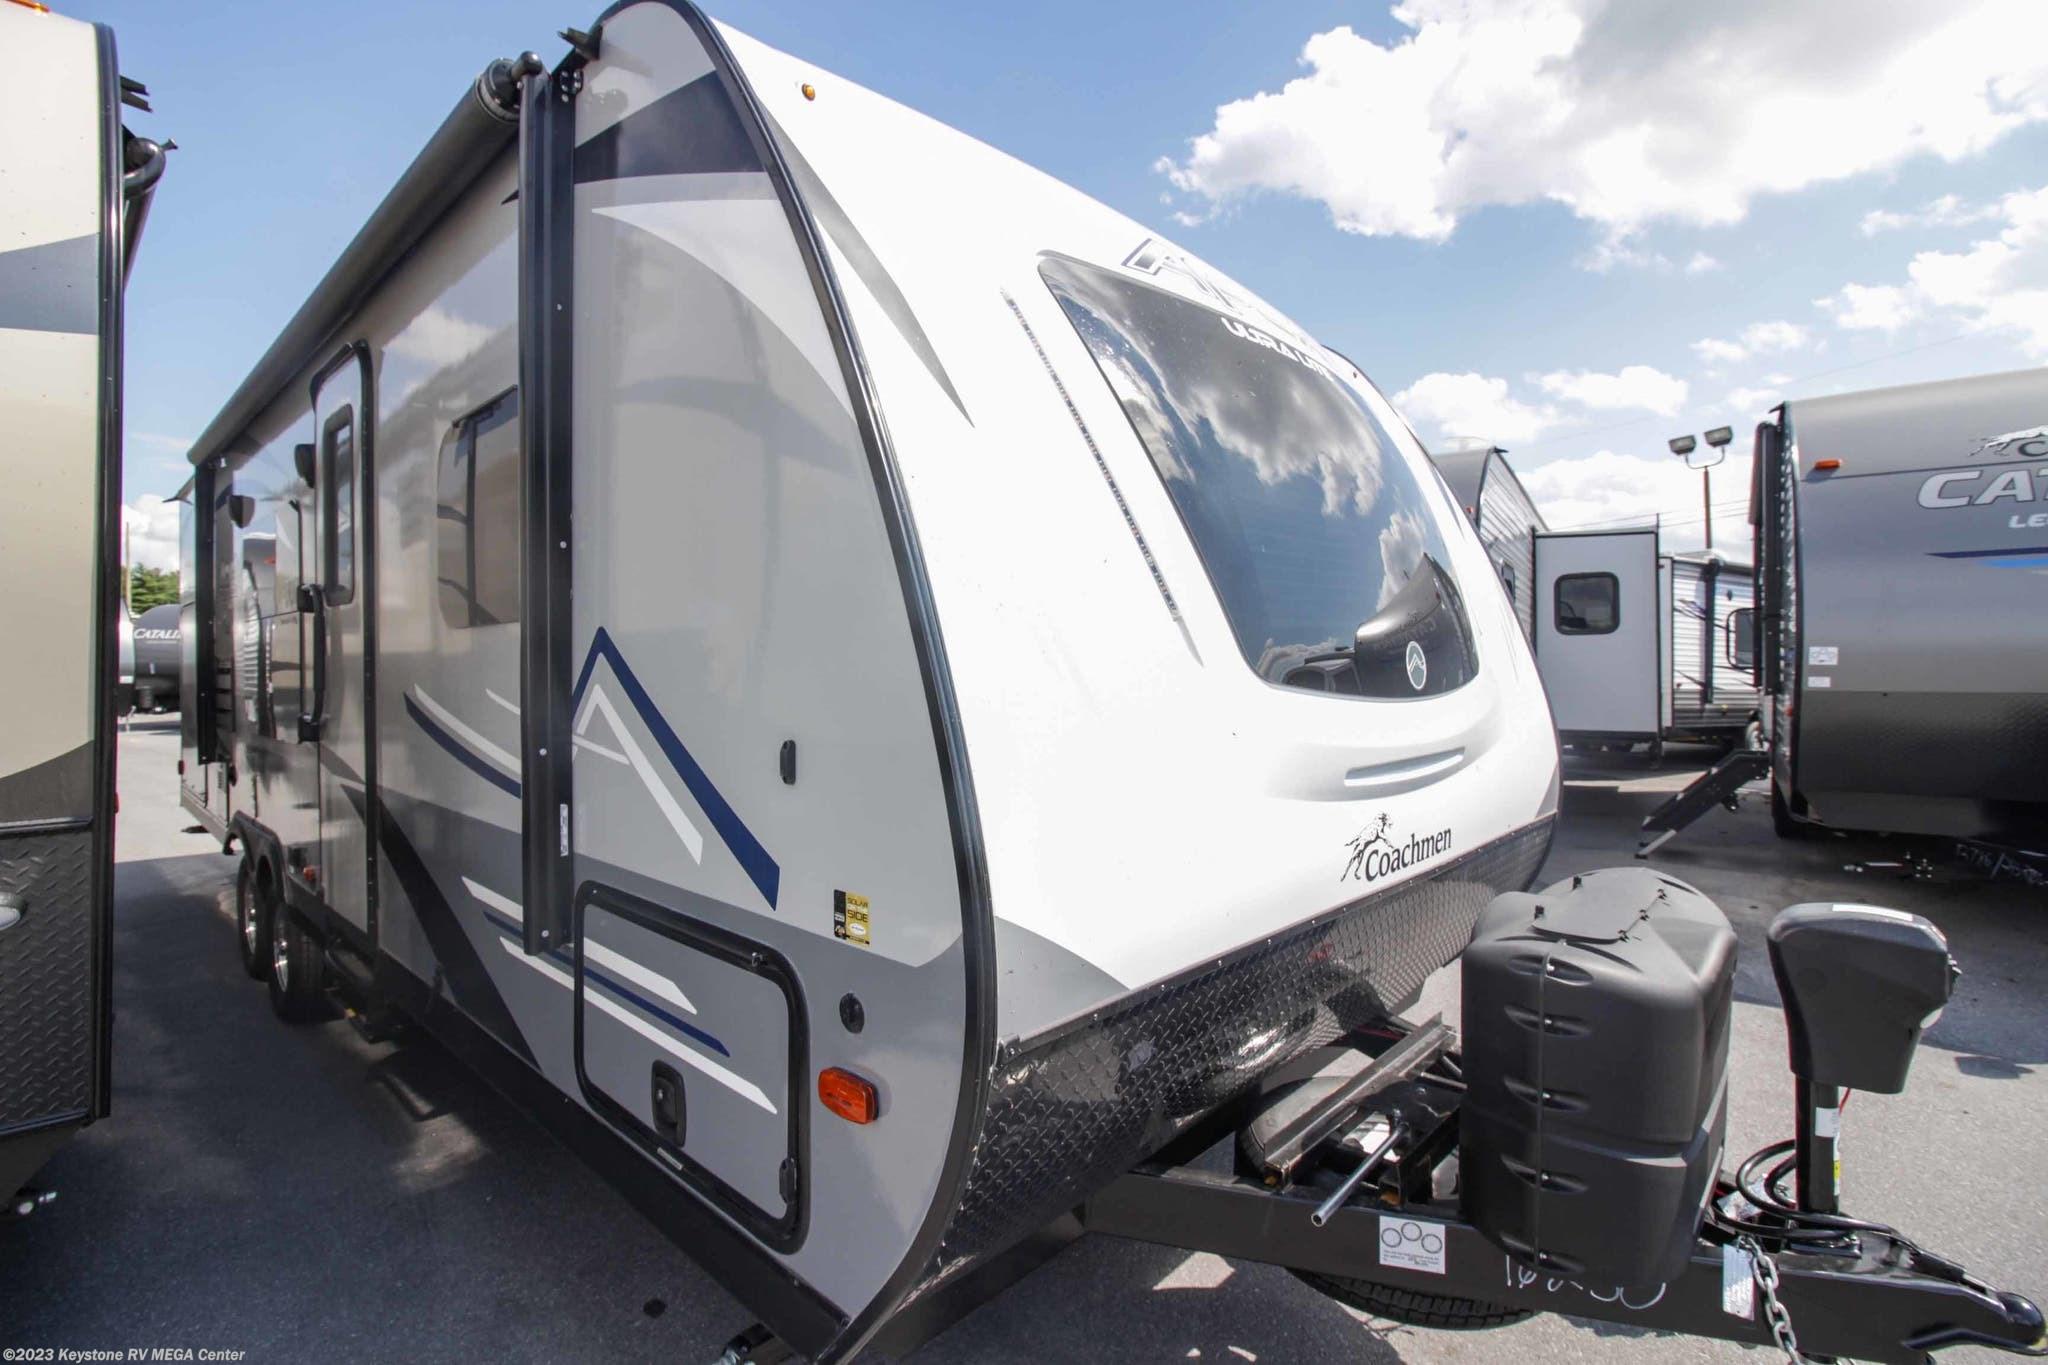 2019 Coachmen Rv Apex 251rbk For Sale In Greencastle Pa 17225 Travel Trailers Wiring Diagram Previous